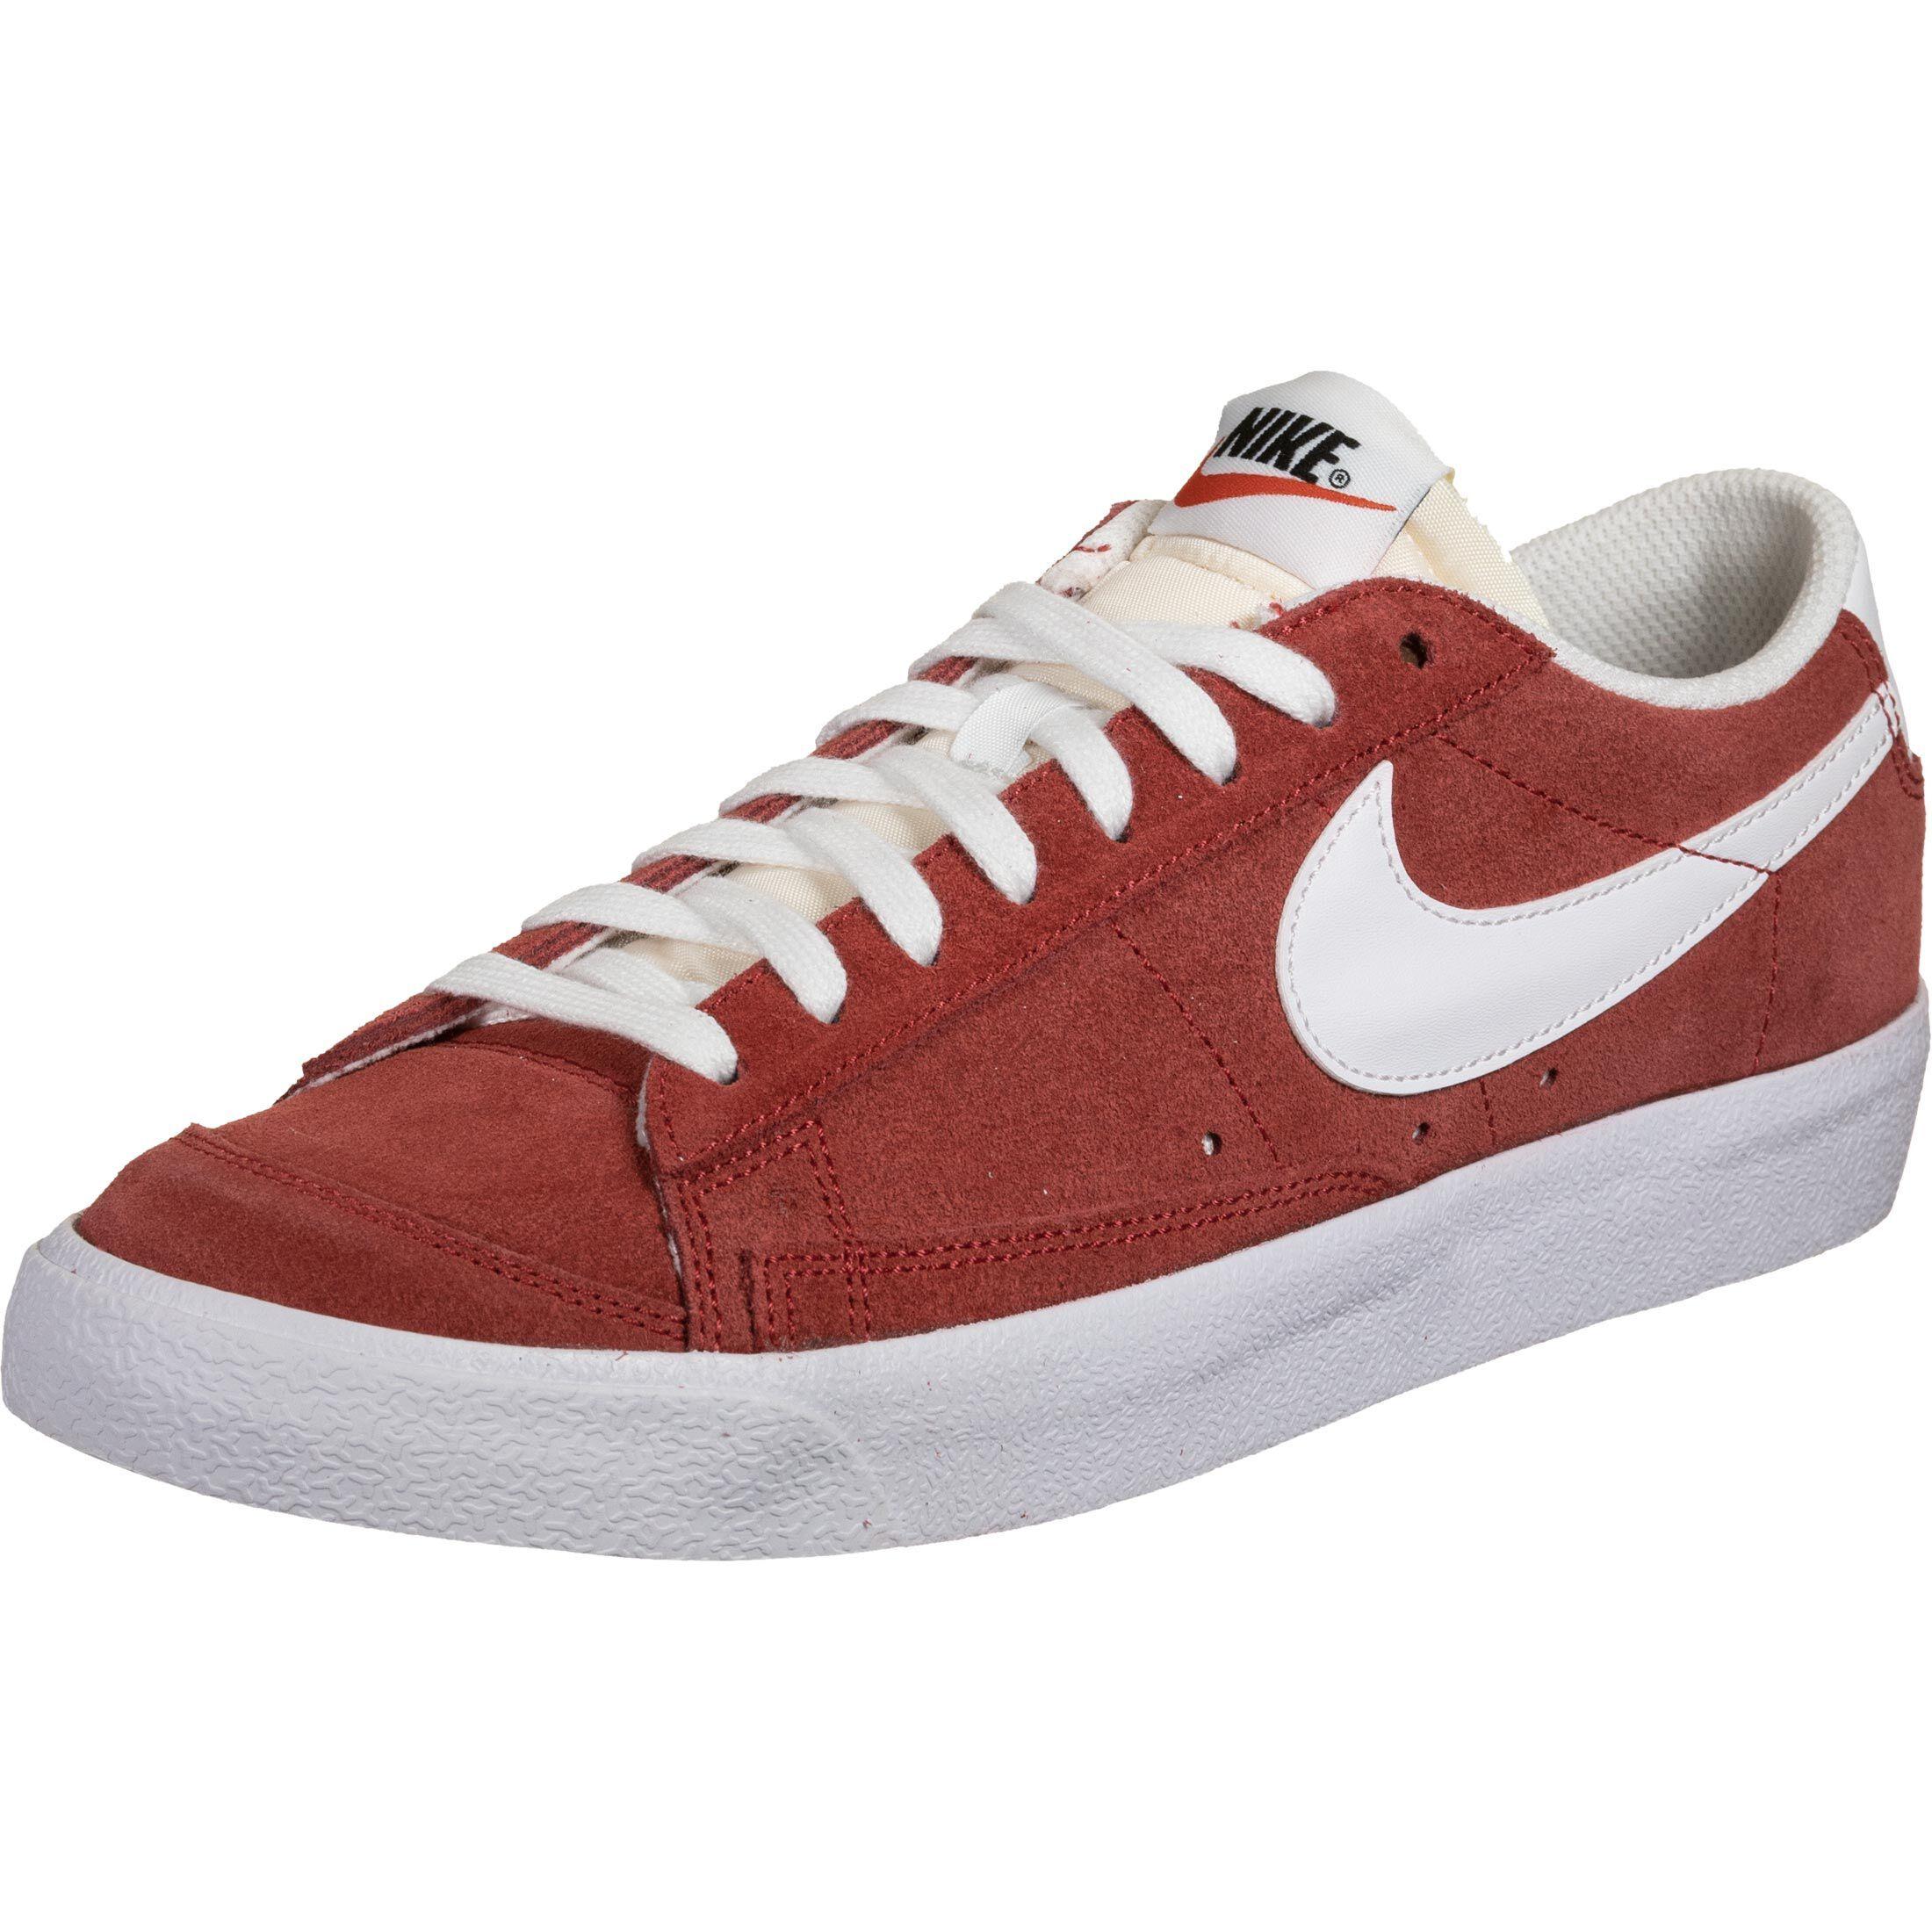 Nike Blazer Low 77, 41 EU, homme, rouge